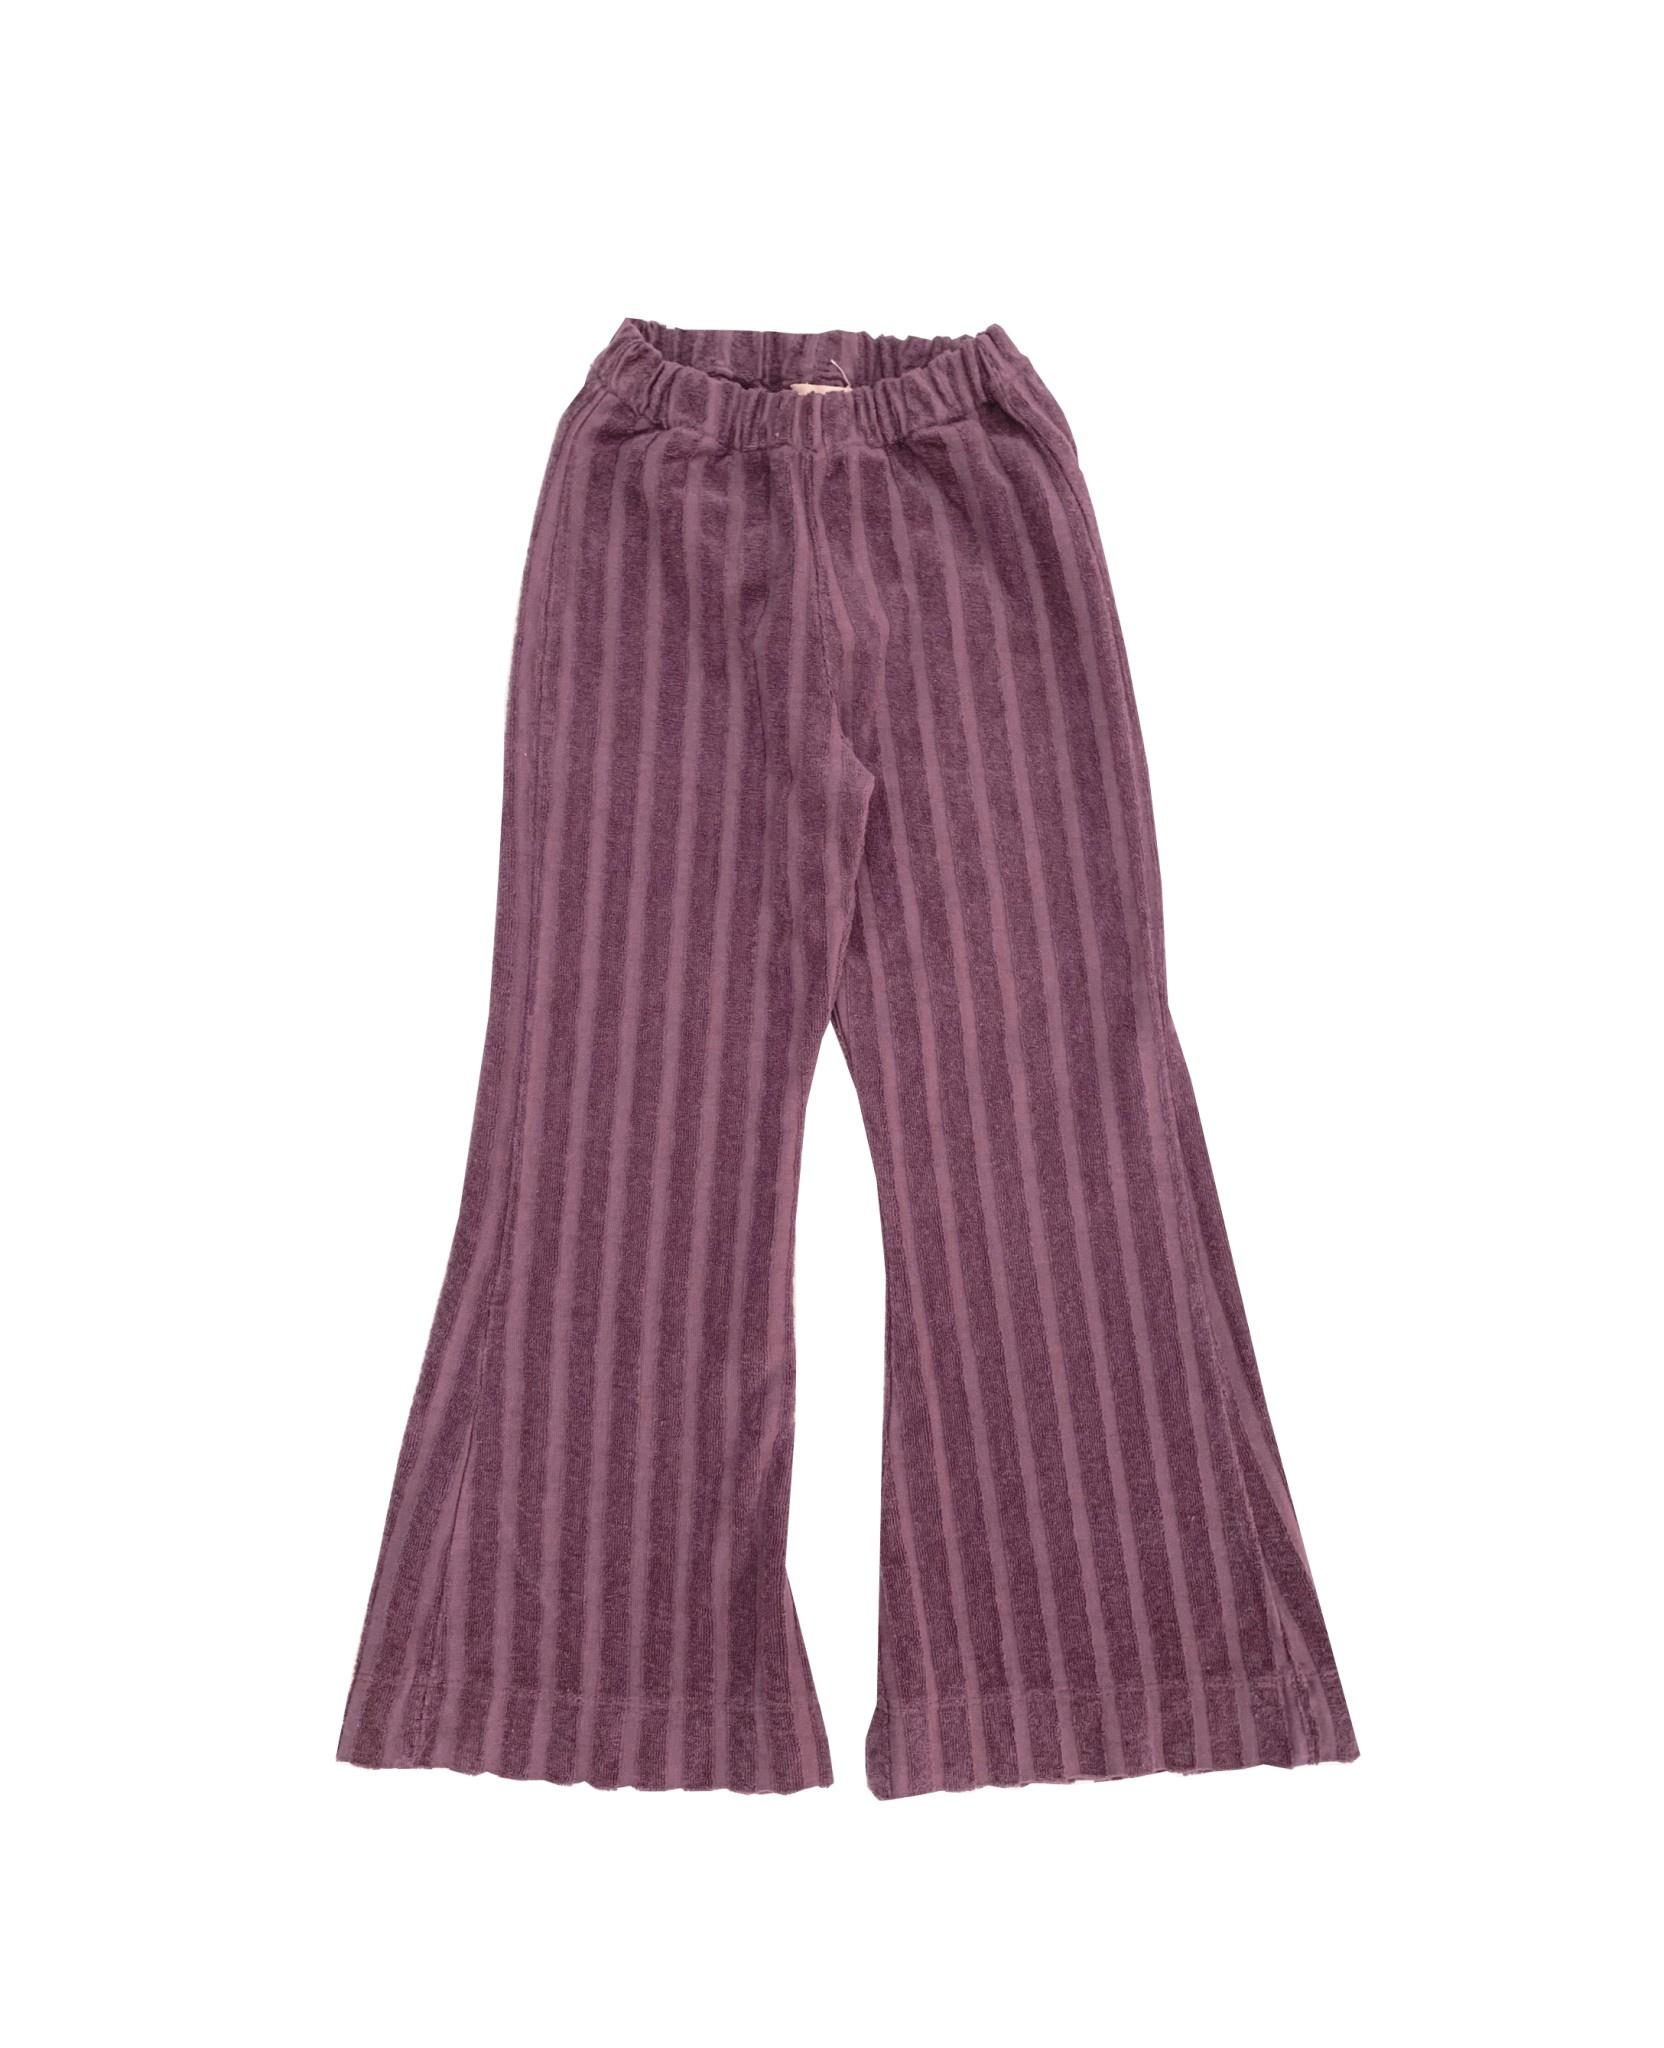 Ribvelvet pants grape-1